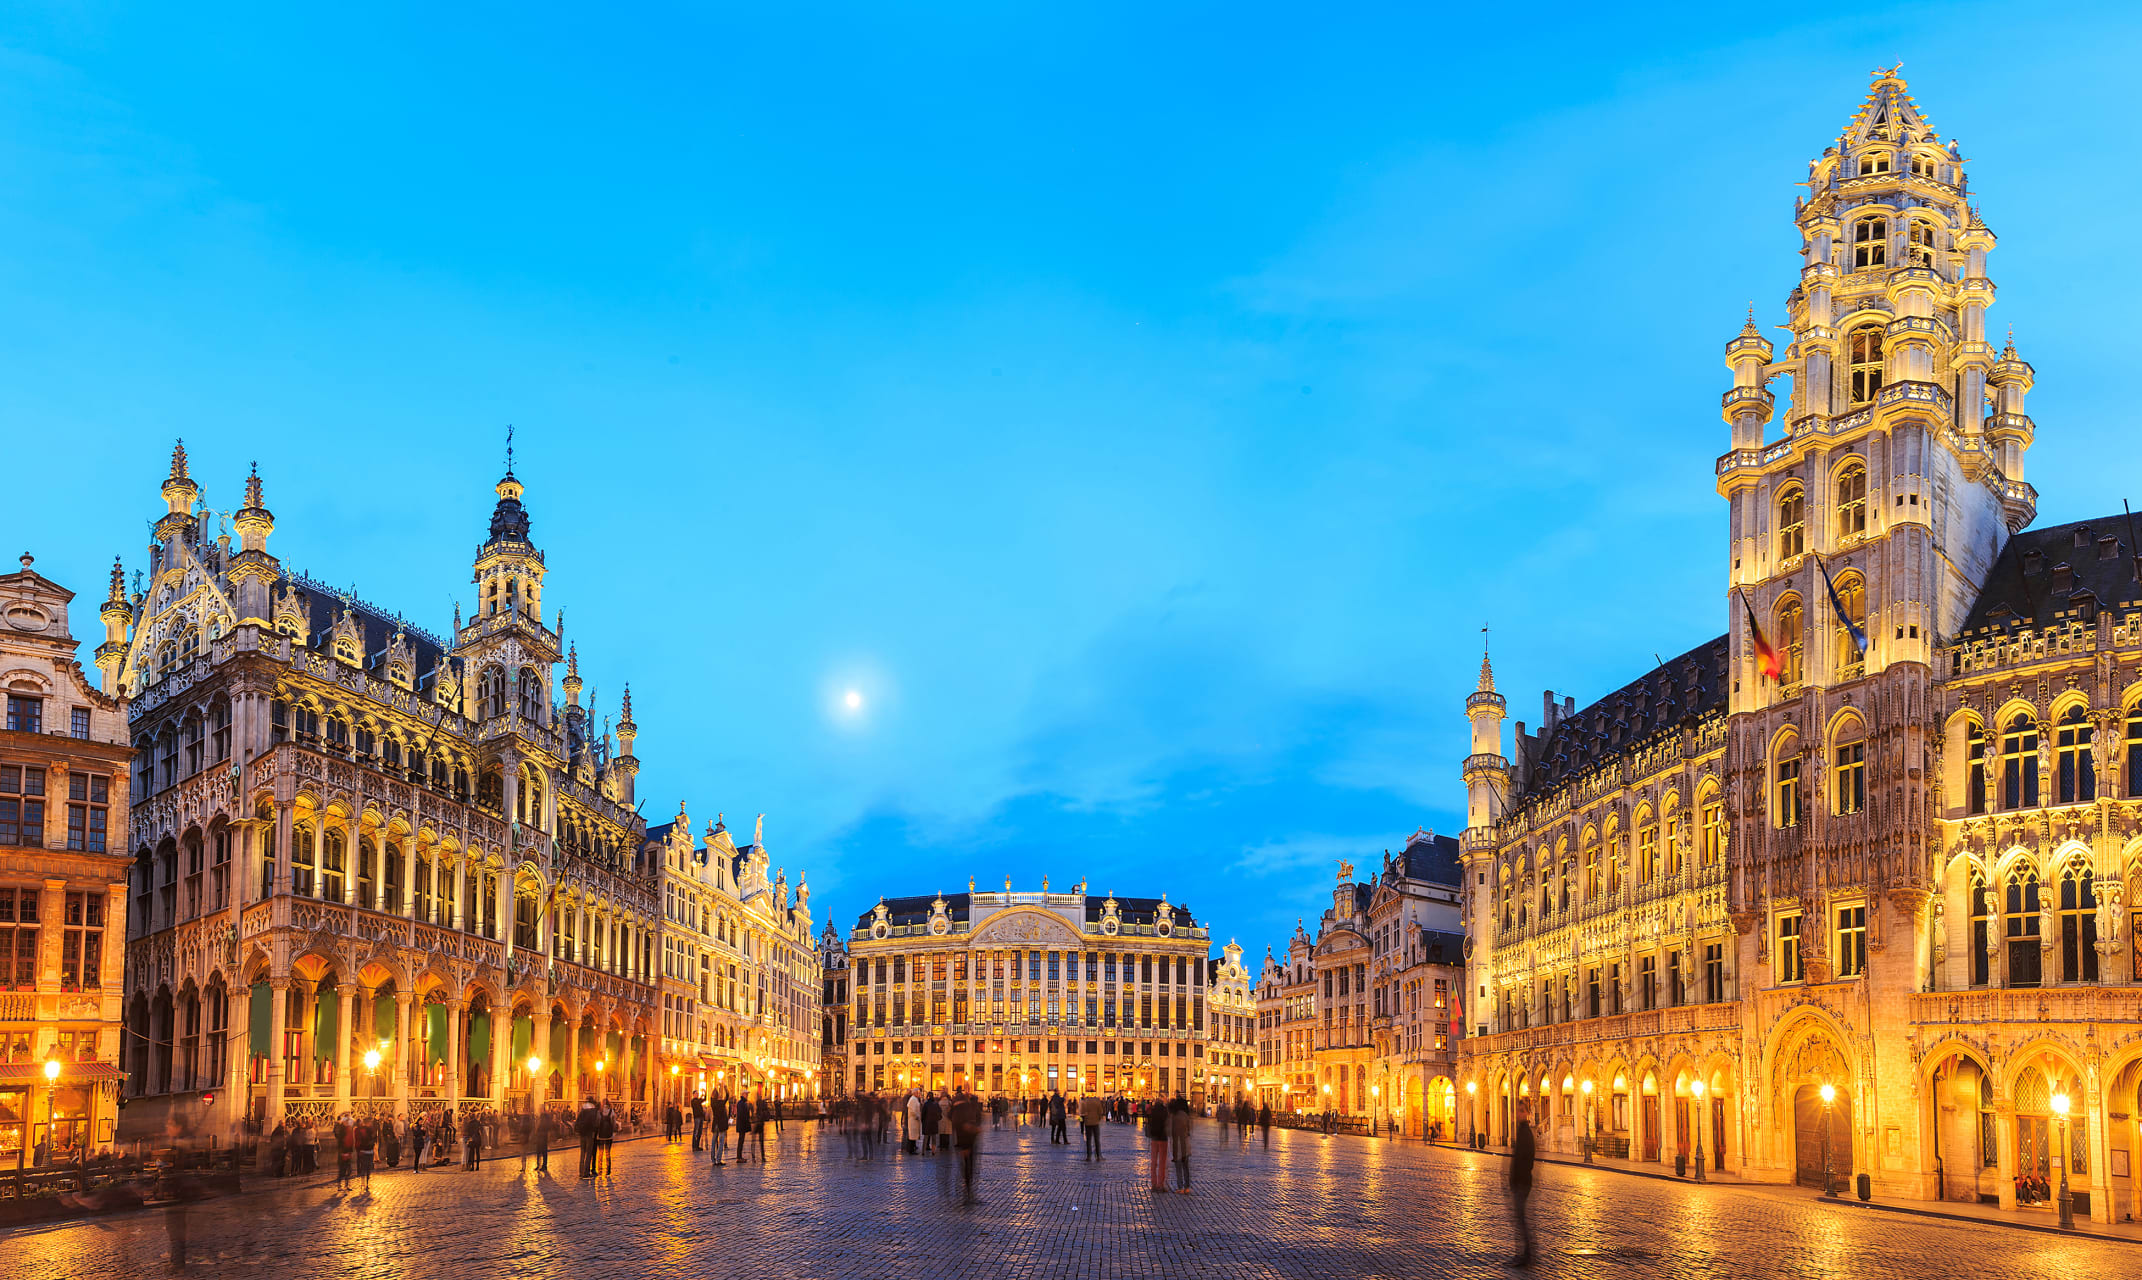 Brussels - Bustling Brussels, the medieval heart of Belgium